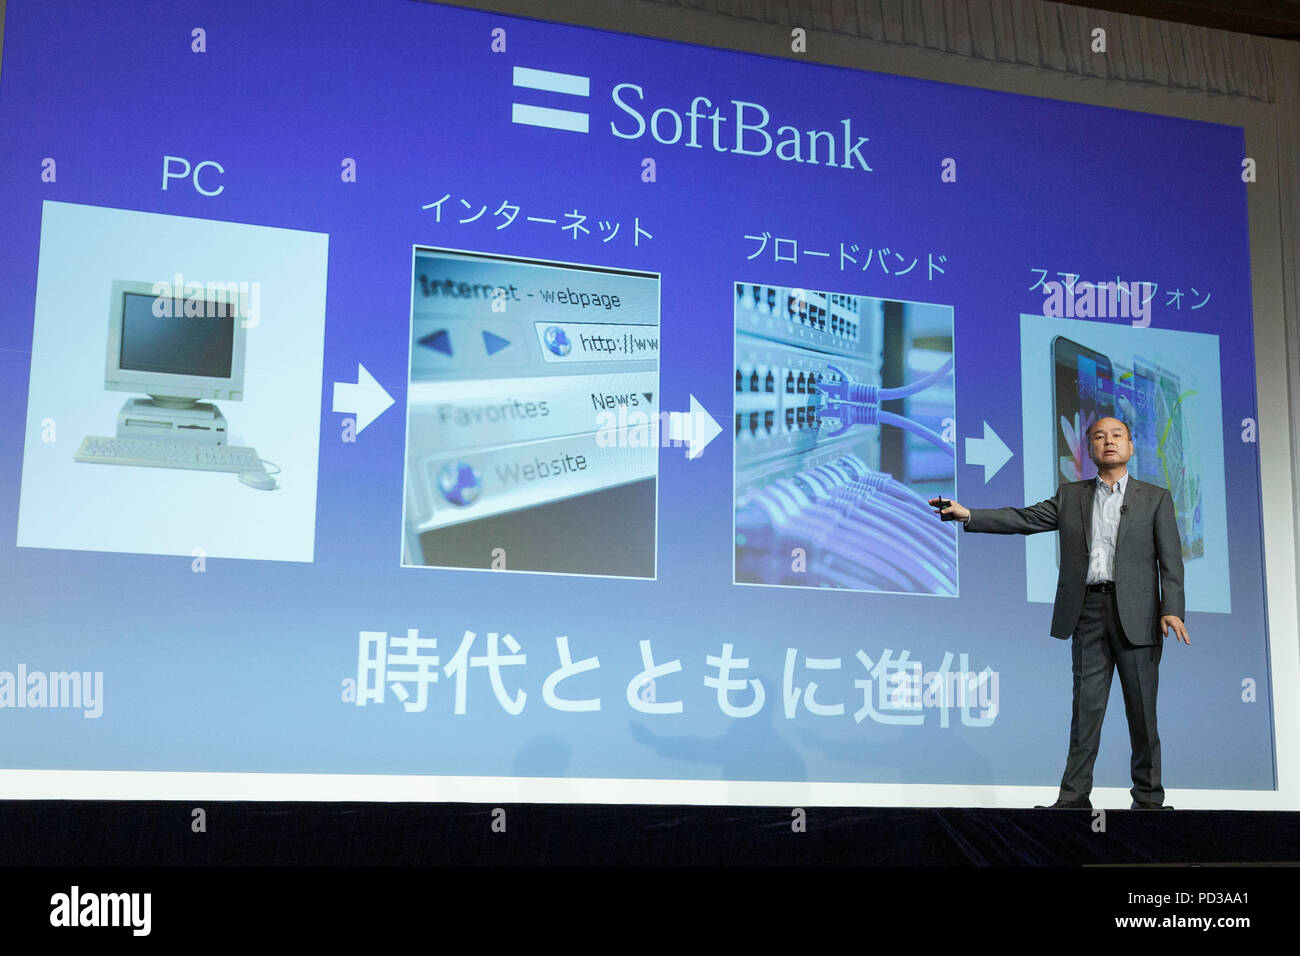 Softbank Arm Stock Photos & Softbank Arm Stock Images - Alamy